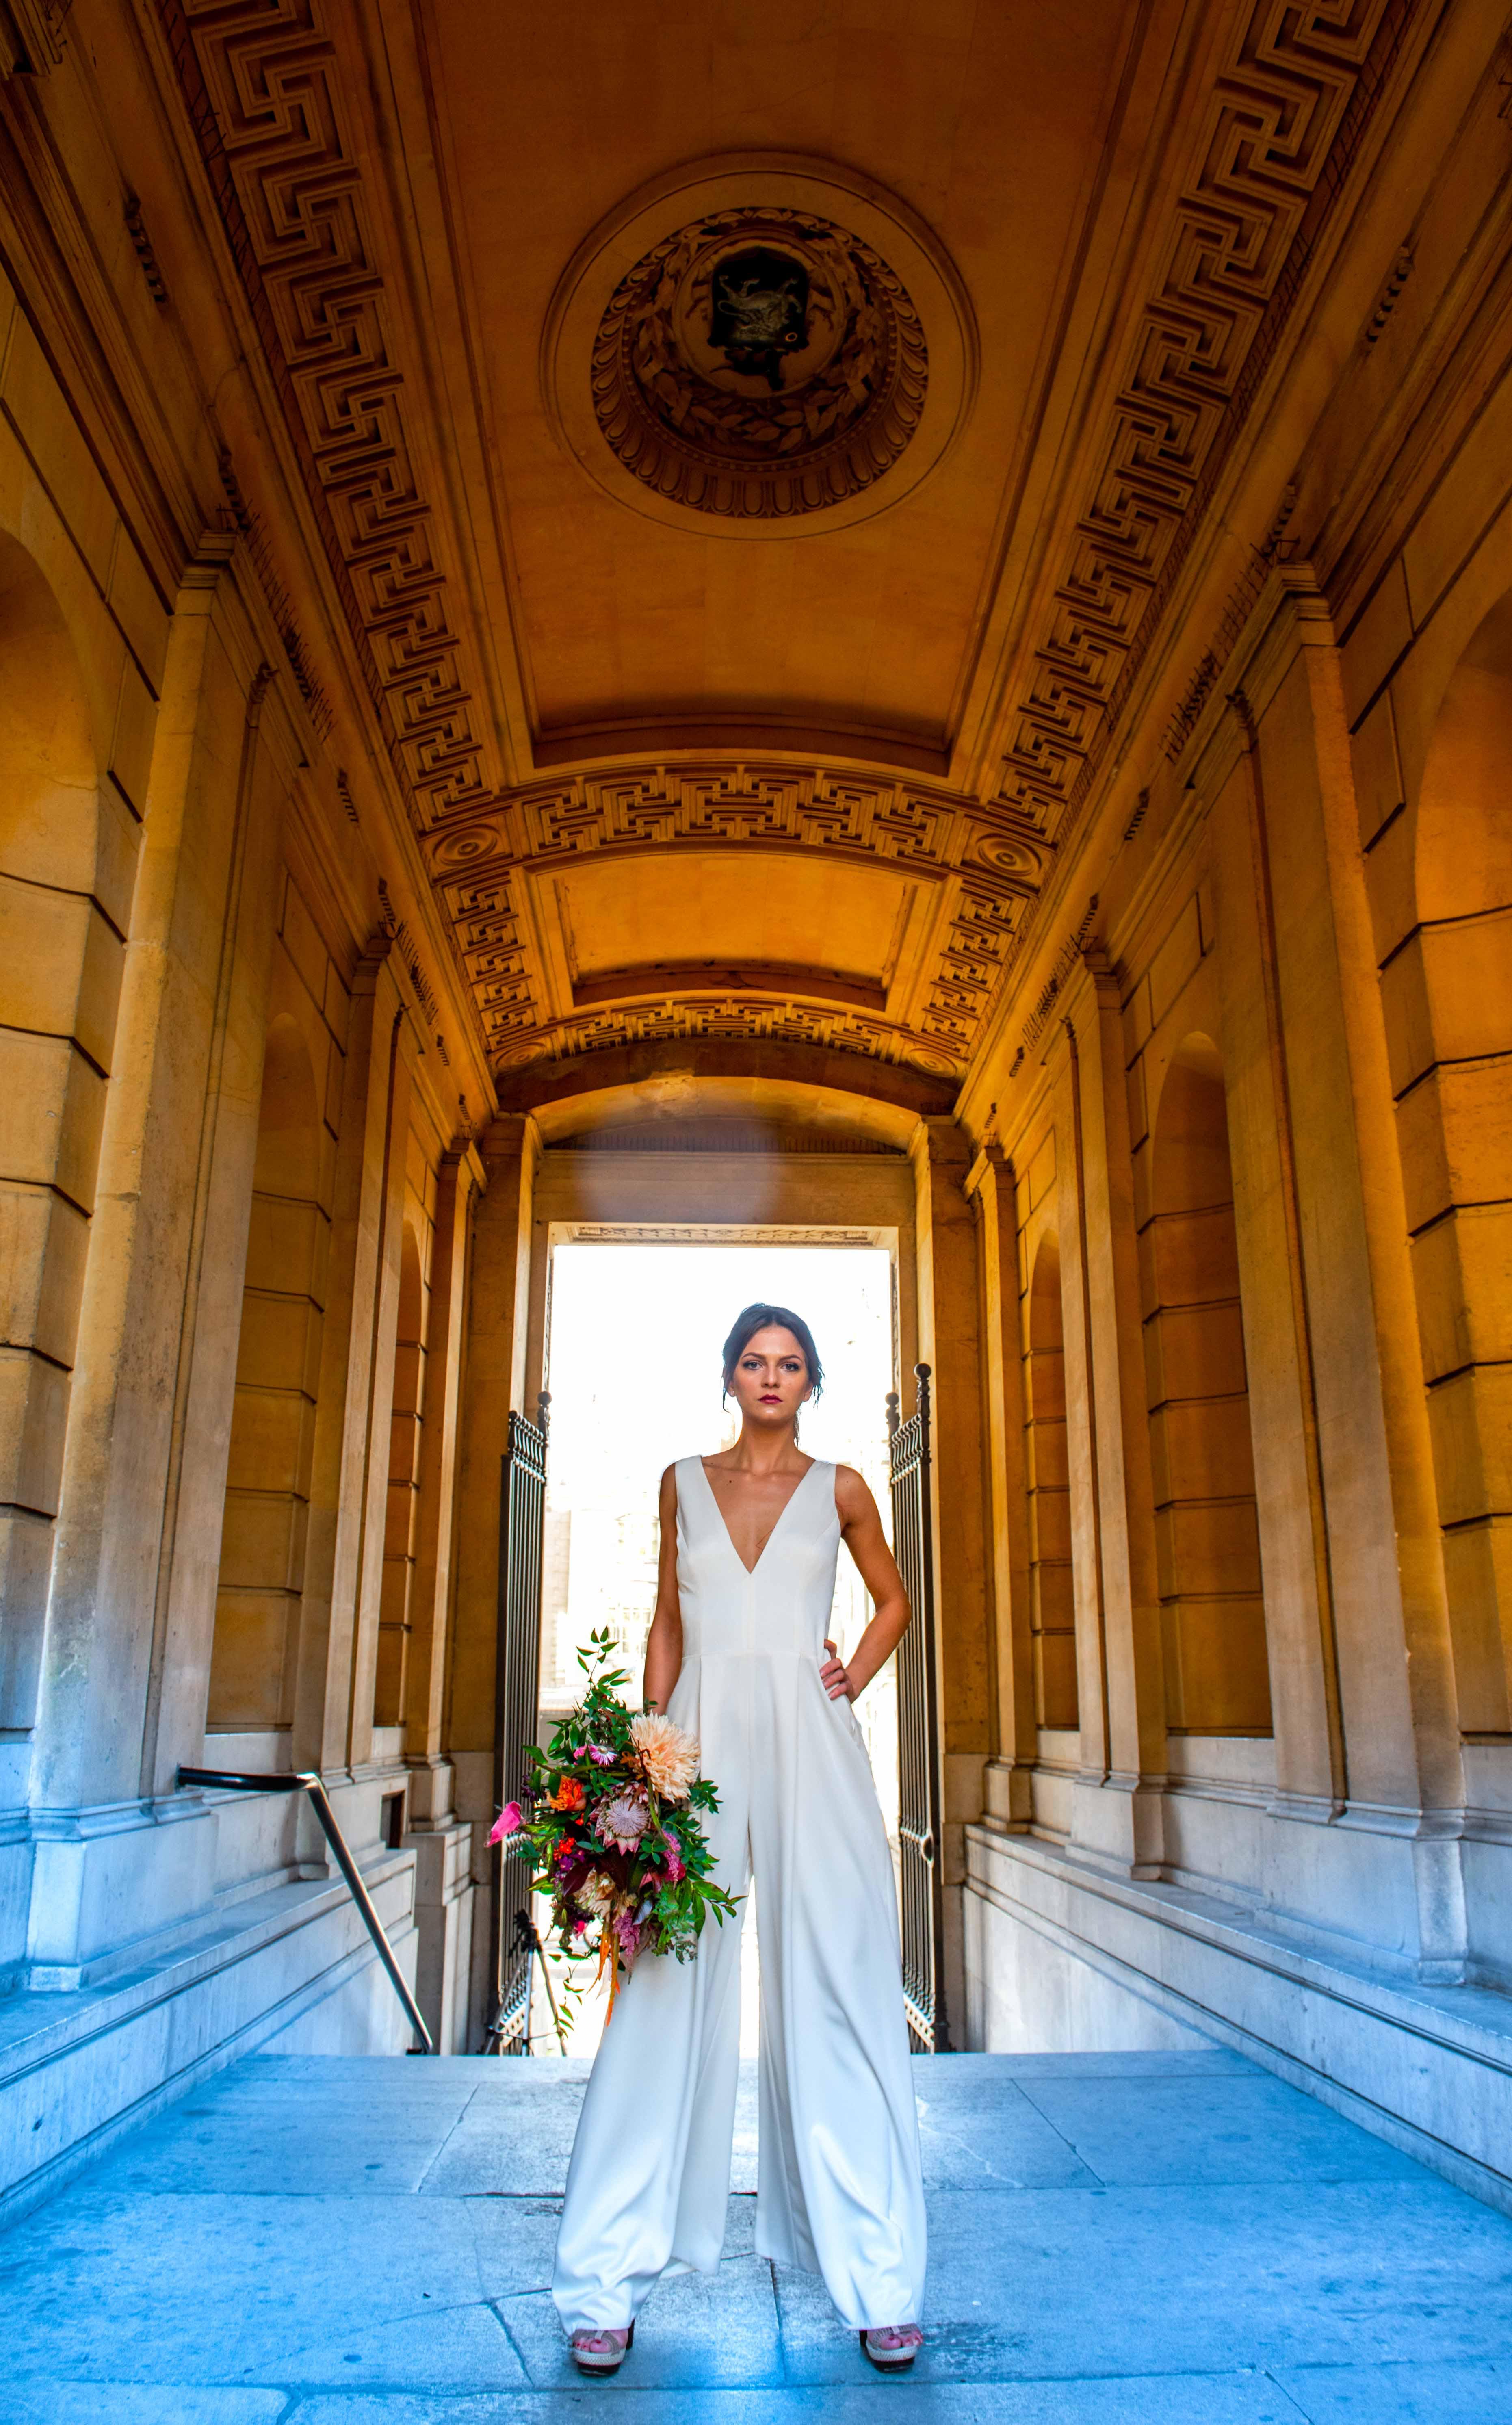 A gorgeous bride posing at The Ashmolean Museum